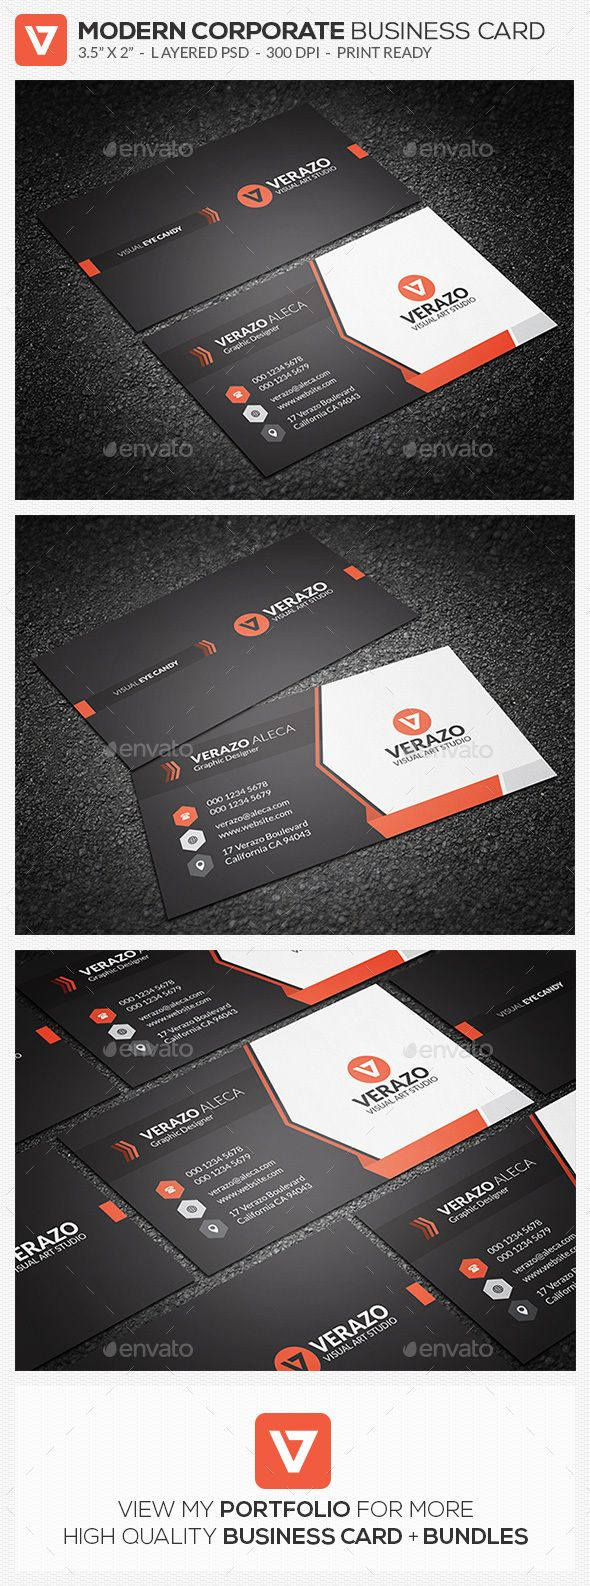 Creative modern corporate business card template pinterest creative modern corporate business card template corporate business cards download here reheart Gallery